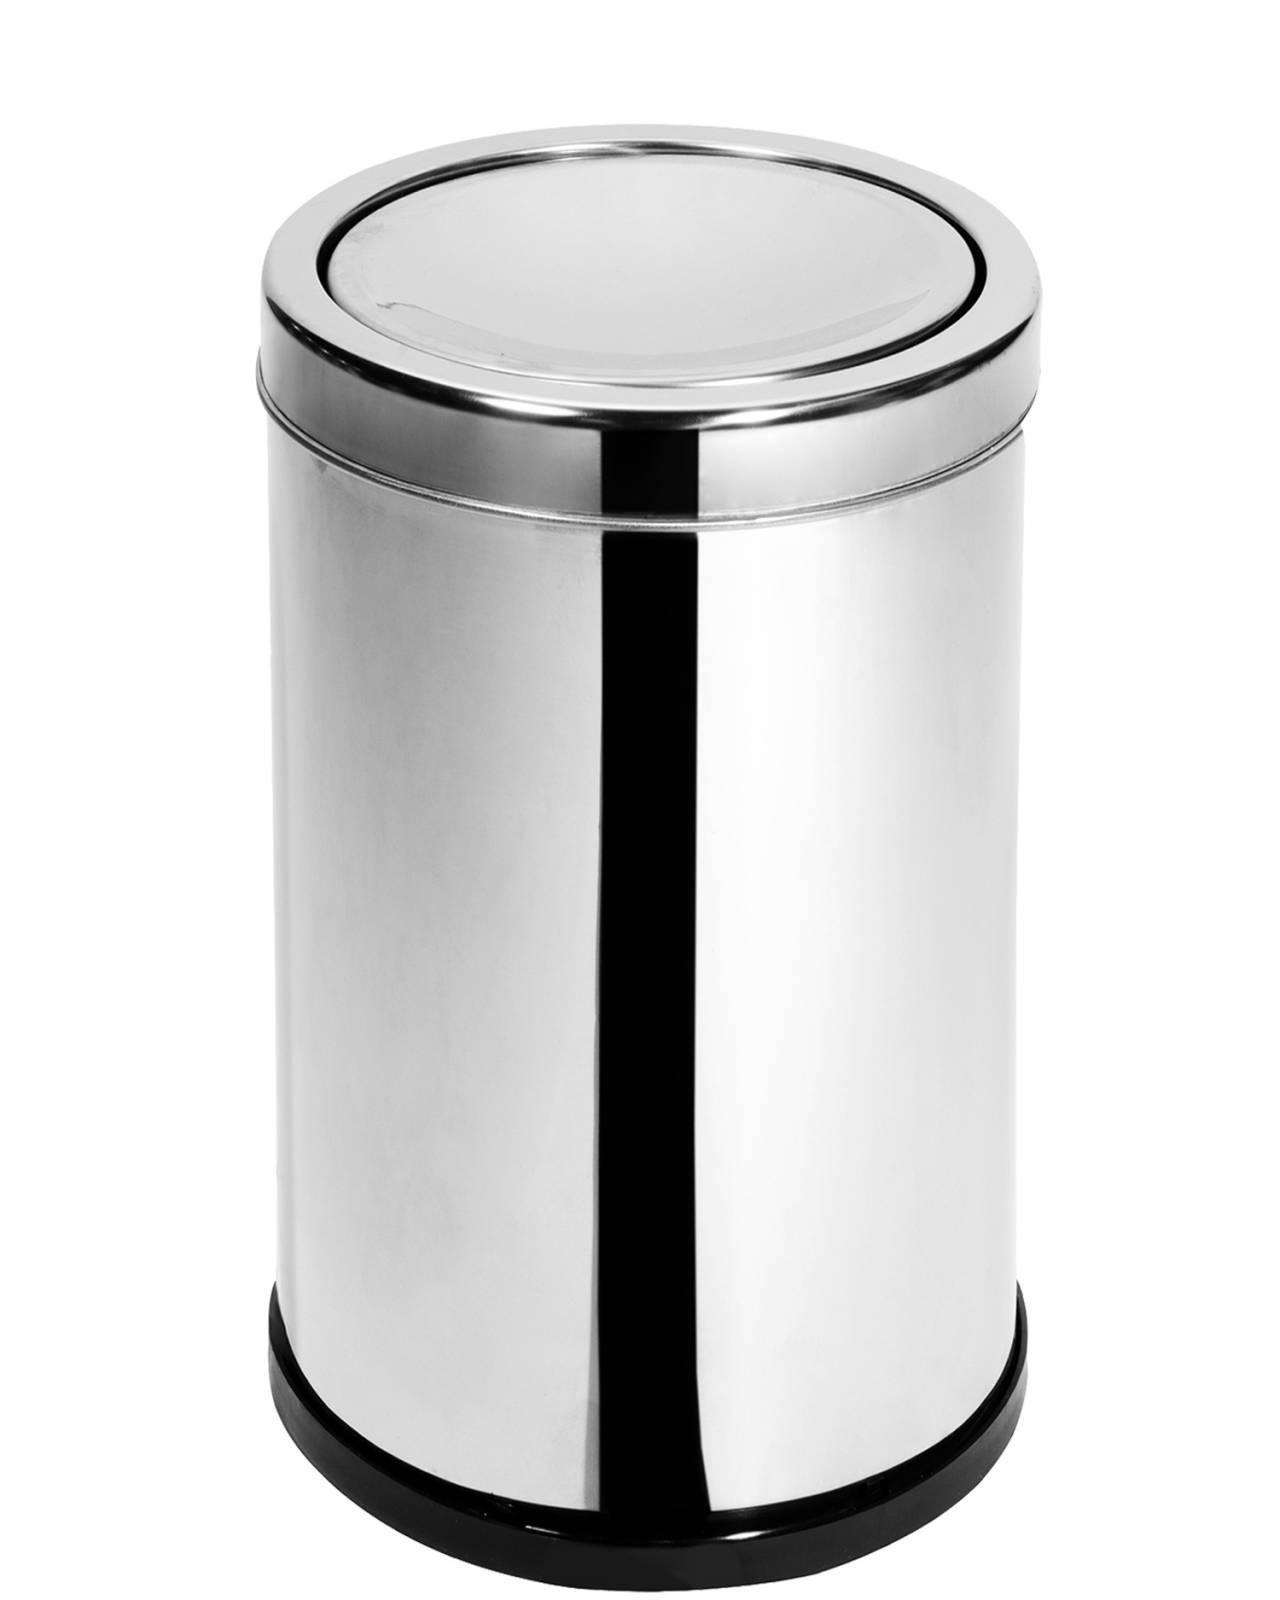 Lixeira Inox 30 cm x 50 cm c/ Tampa Basculante - 35 Litros Elegance